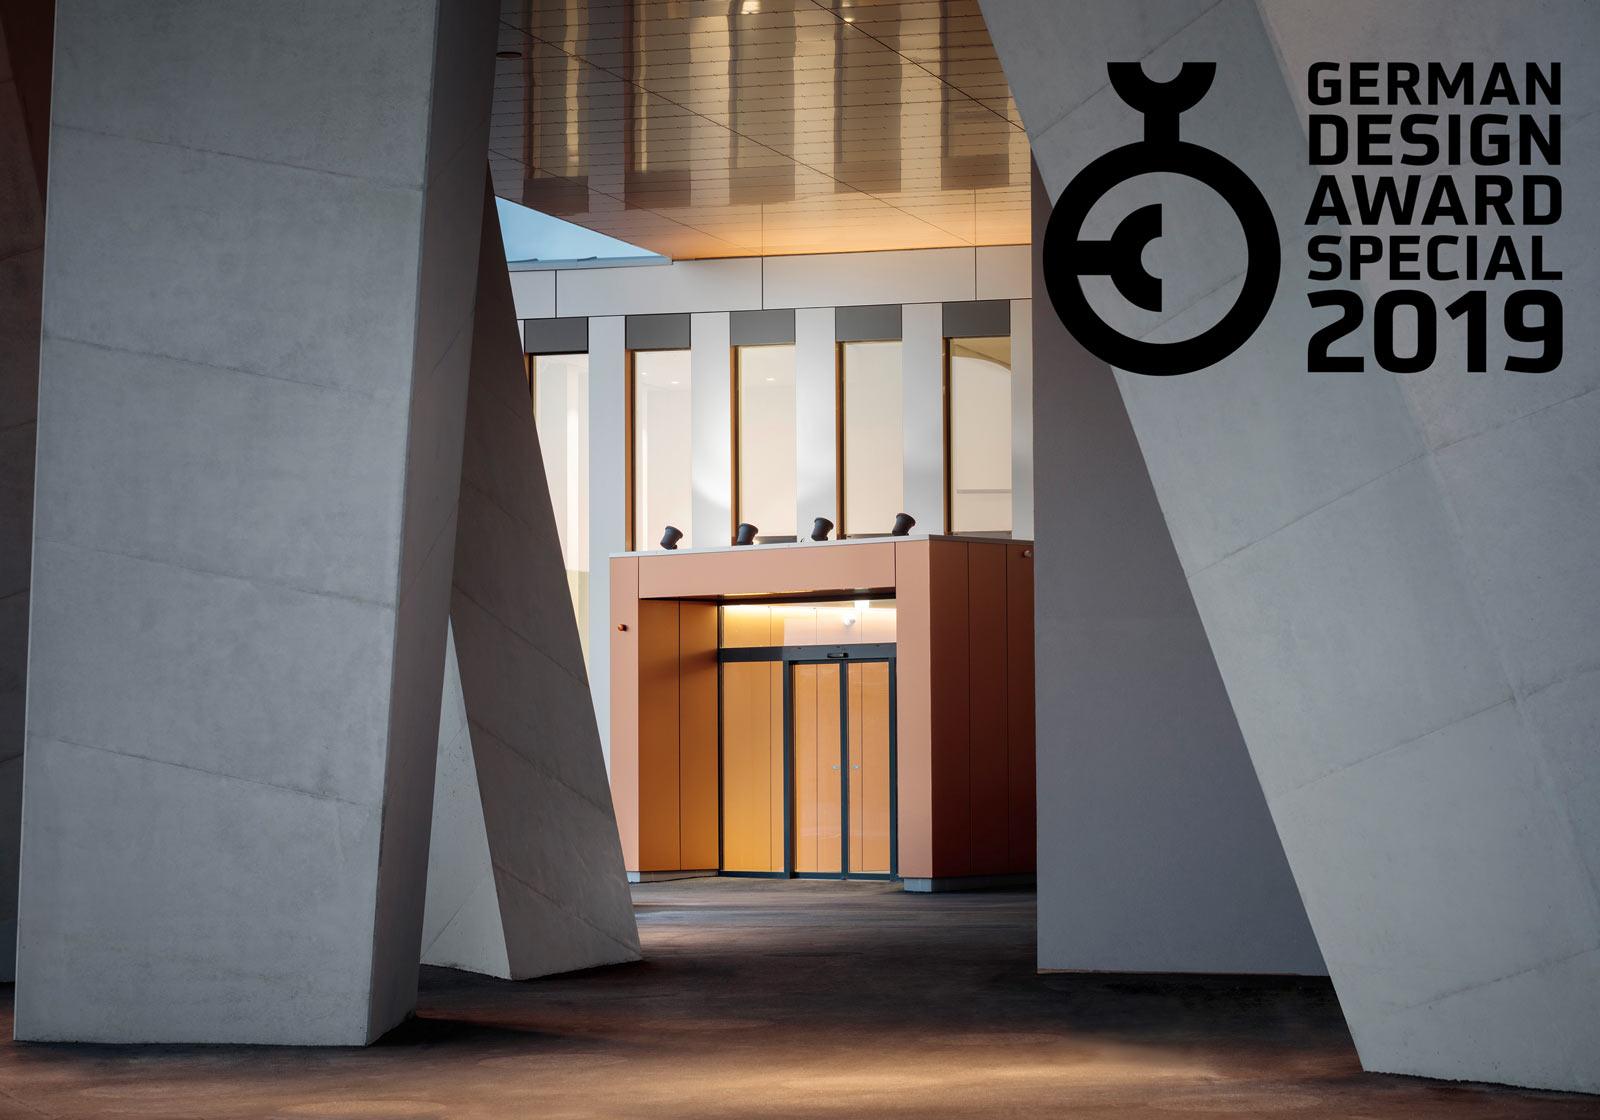 German Design Award for the OMV office building. Foto: ATP/Kuball